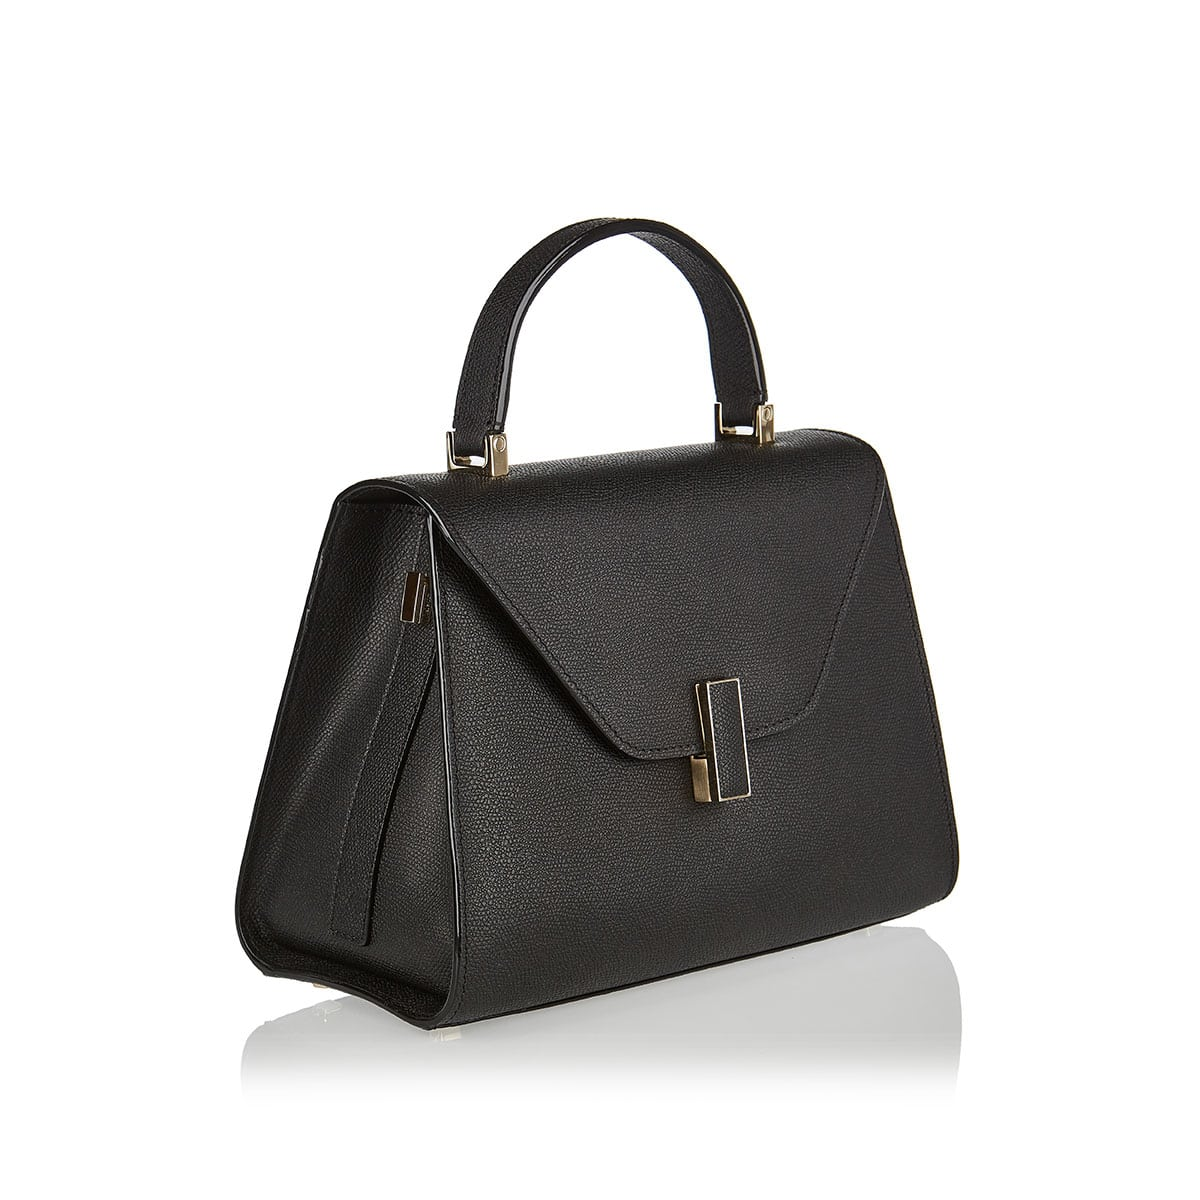 Iside Gioiello medium top-handle bag